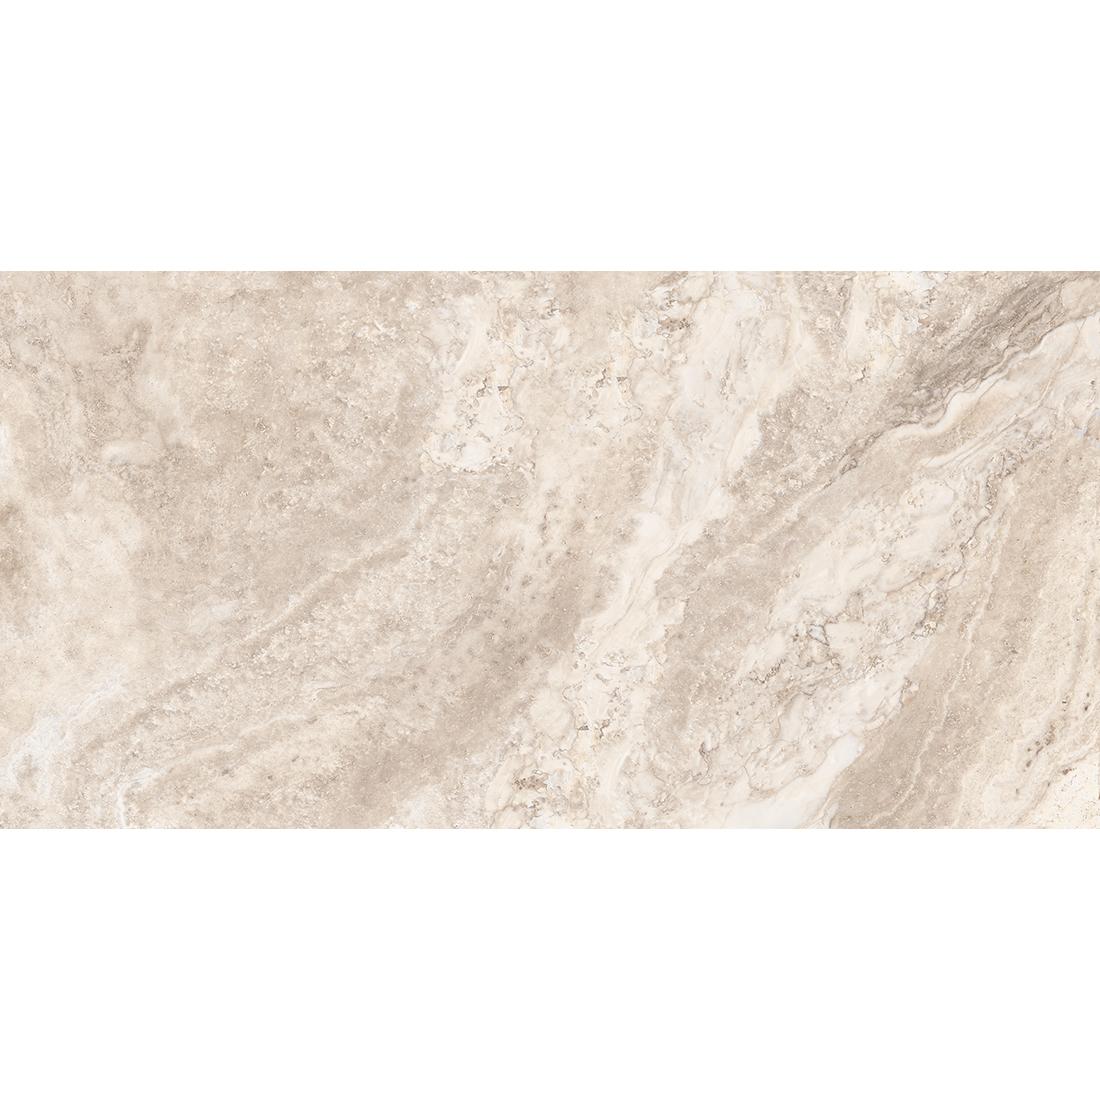 Alabastrino 60x120 Beige Gloss 1